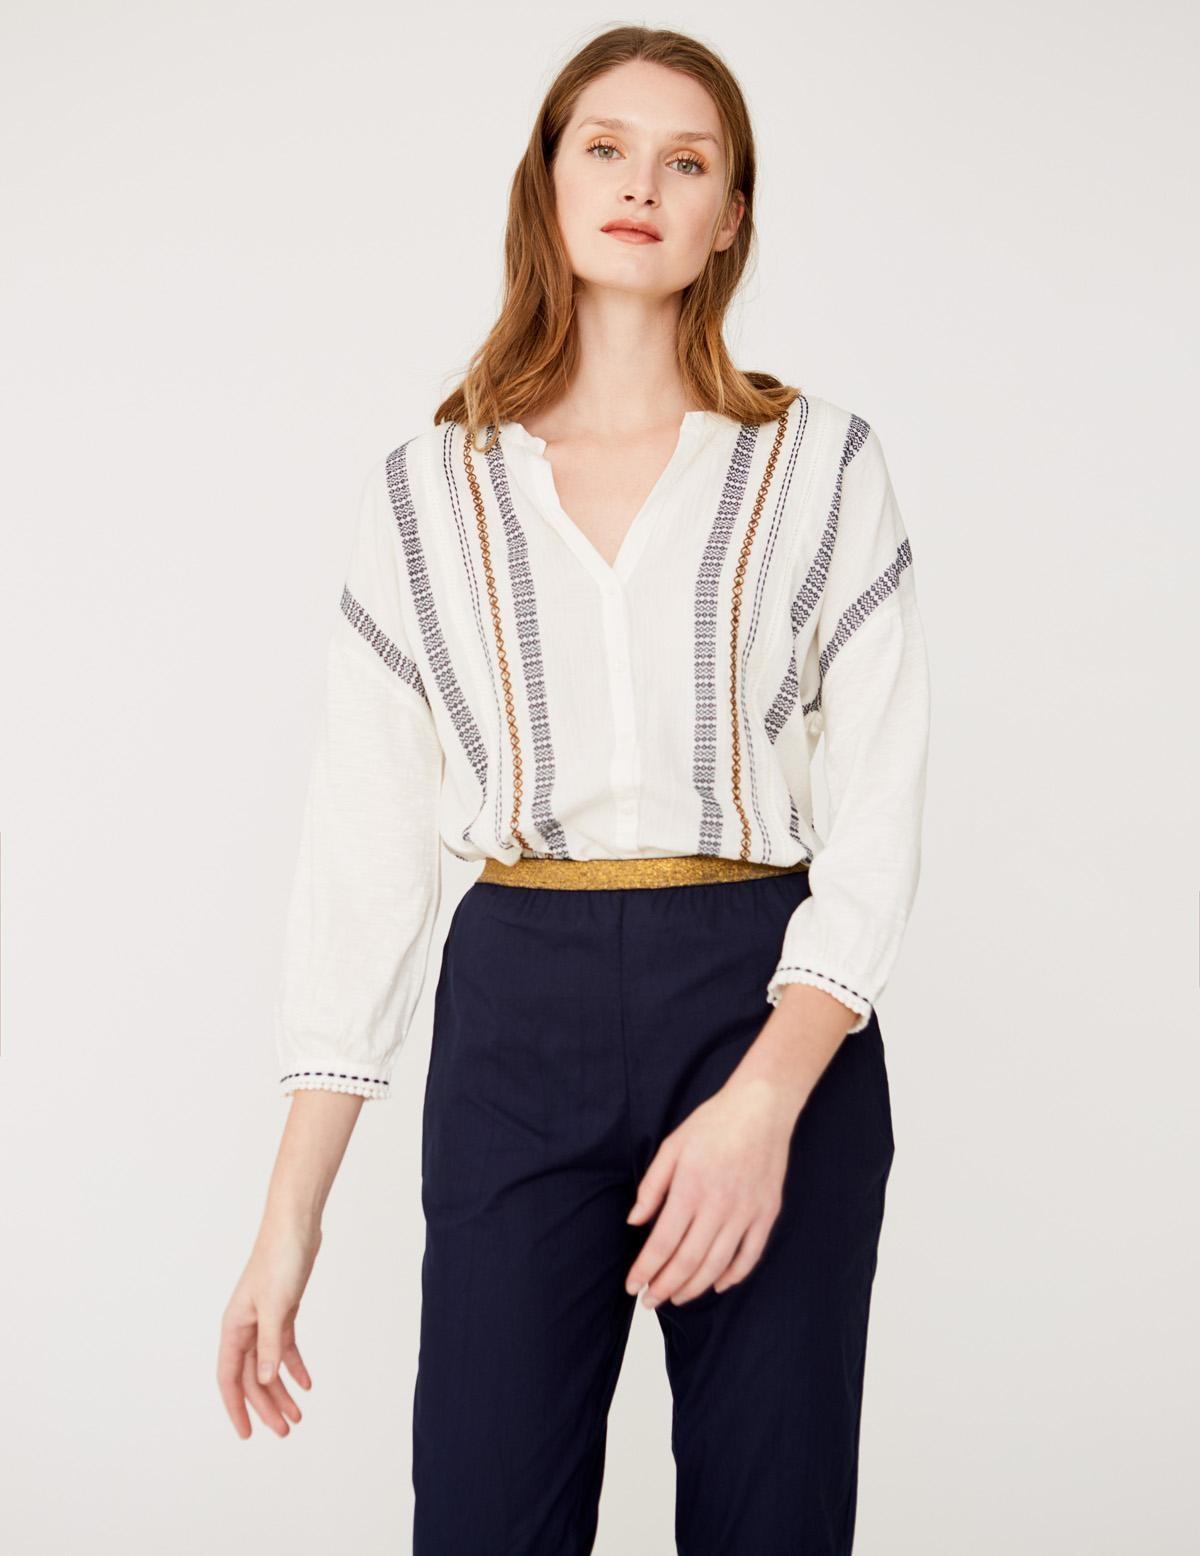 Camisa jacquard y bordado - Ítem2